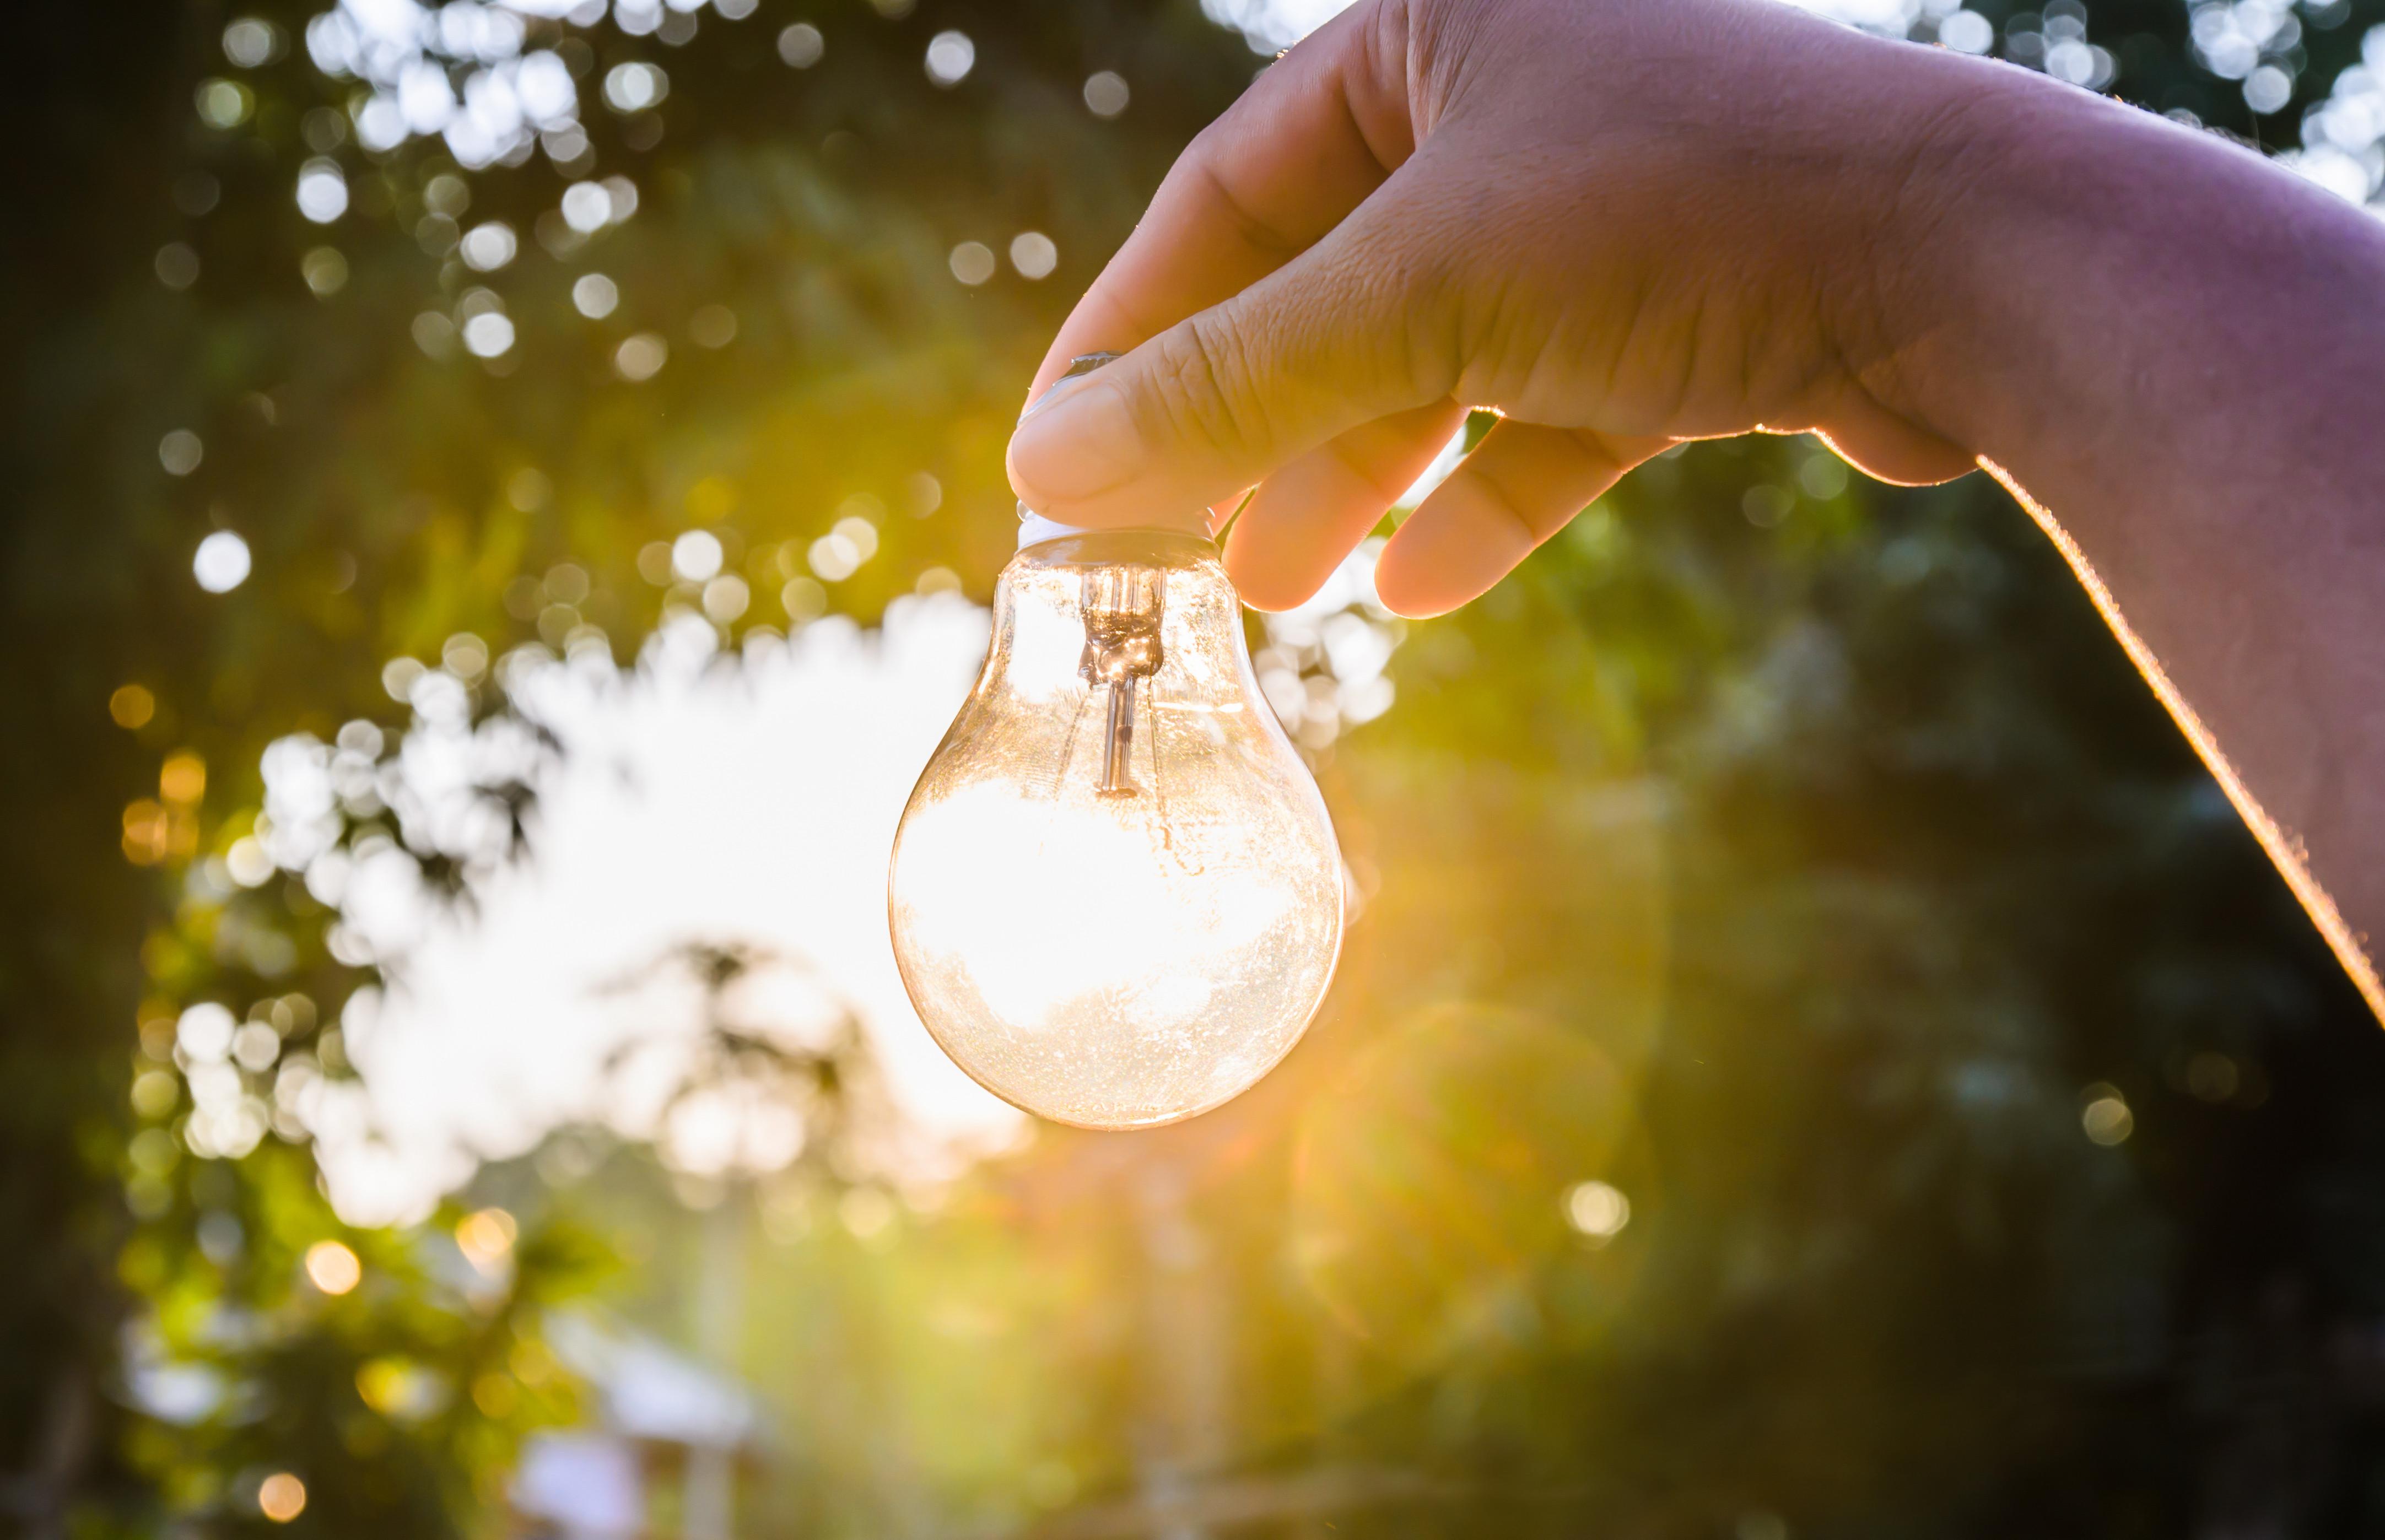 FINDING LIGHT INTHE DARK SERIES